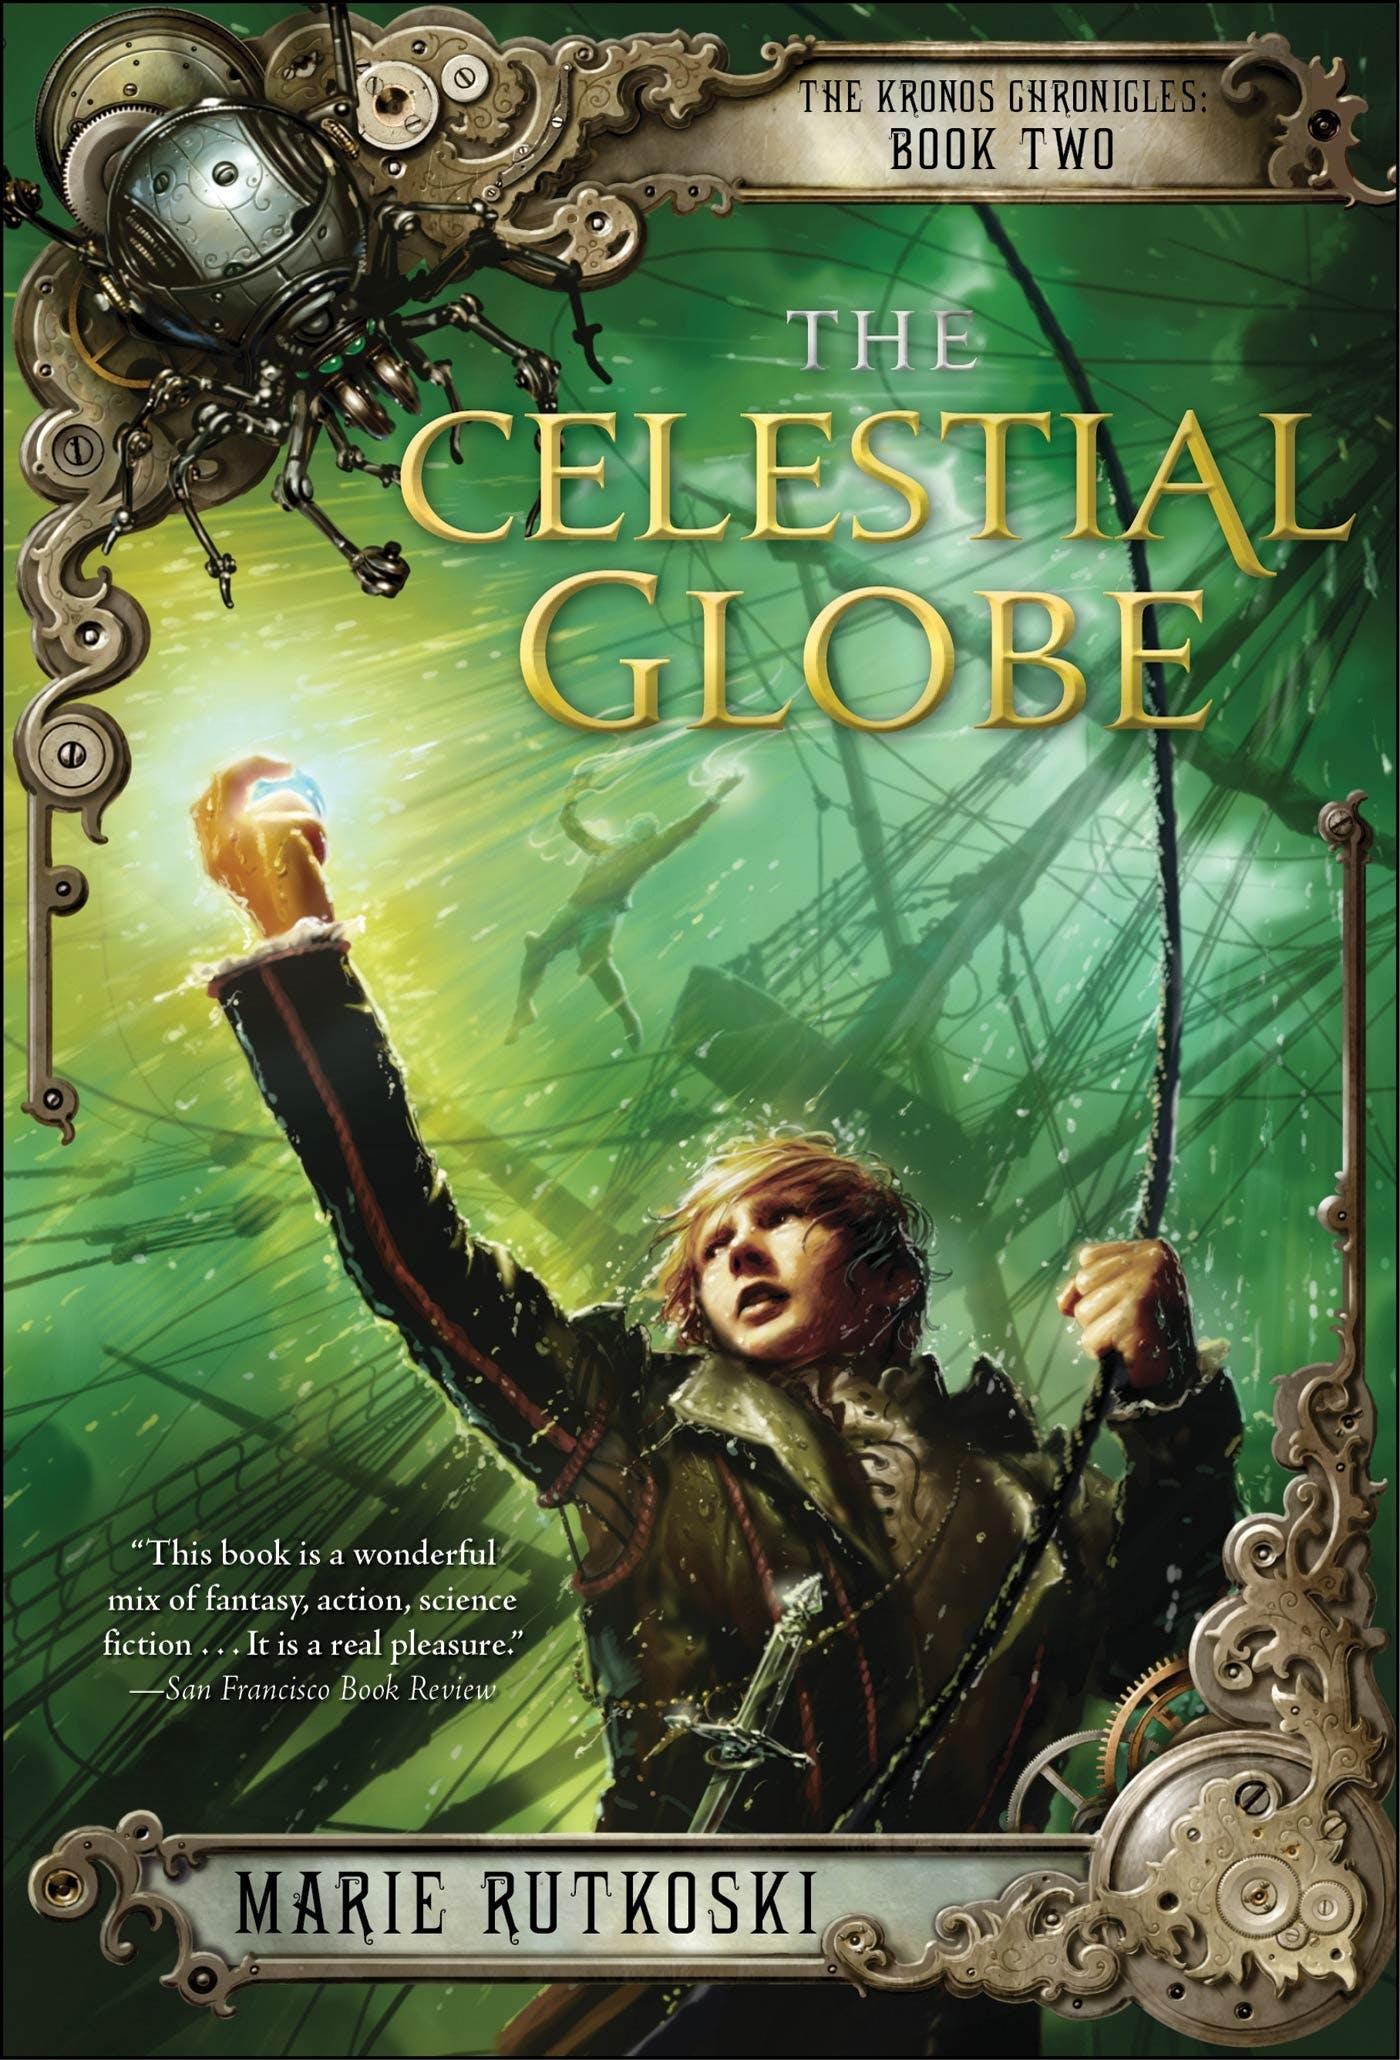 Image of The Celestial Globe